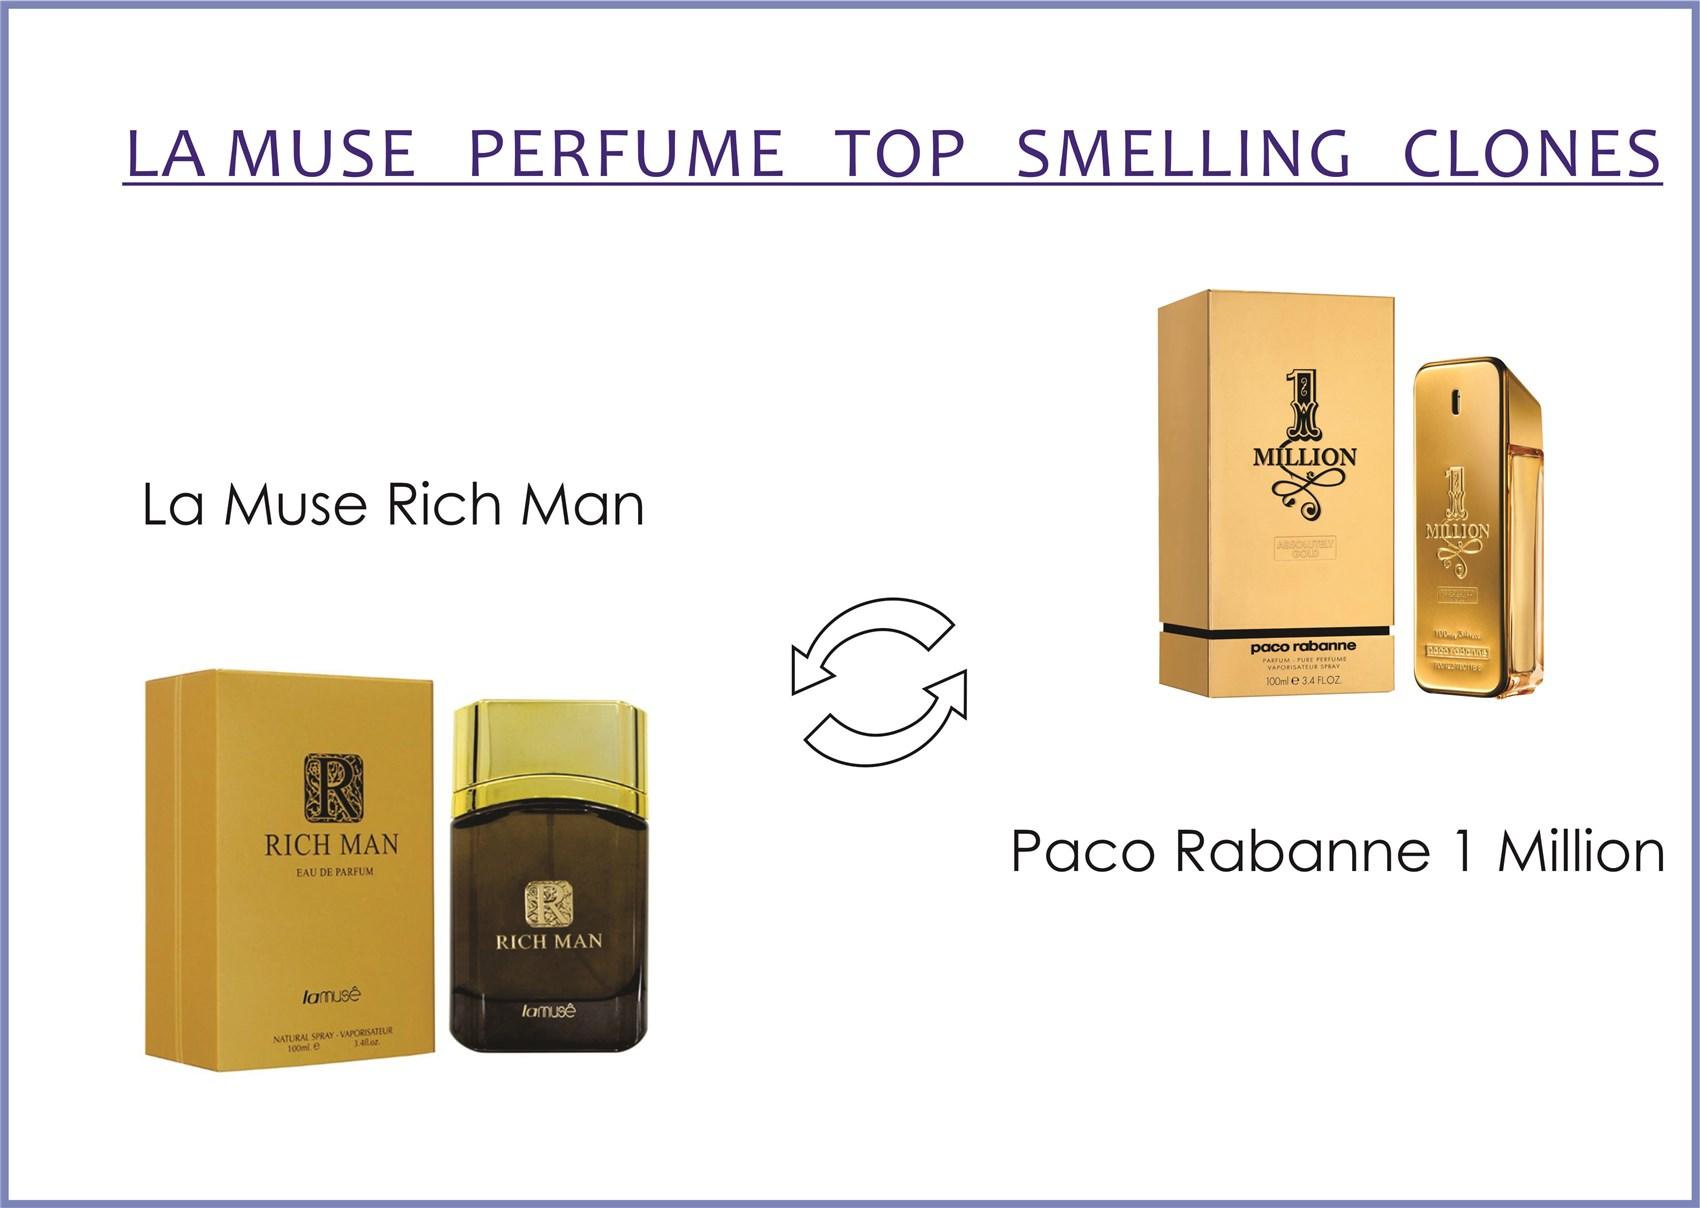 la-muse-rich-man-for-men-100-ml-edp-by-lattafa-perfumes-paco-rabanne-1-million-intense-perfume-for-men-100-ml-edt